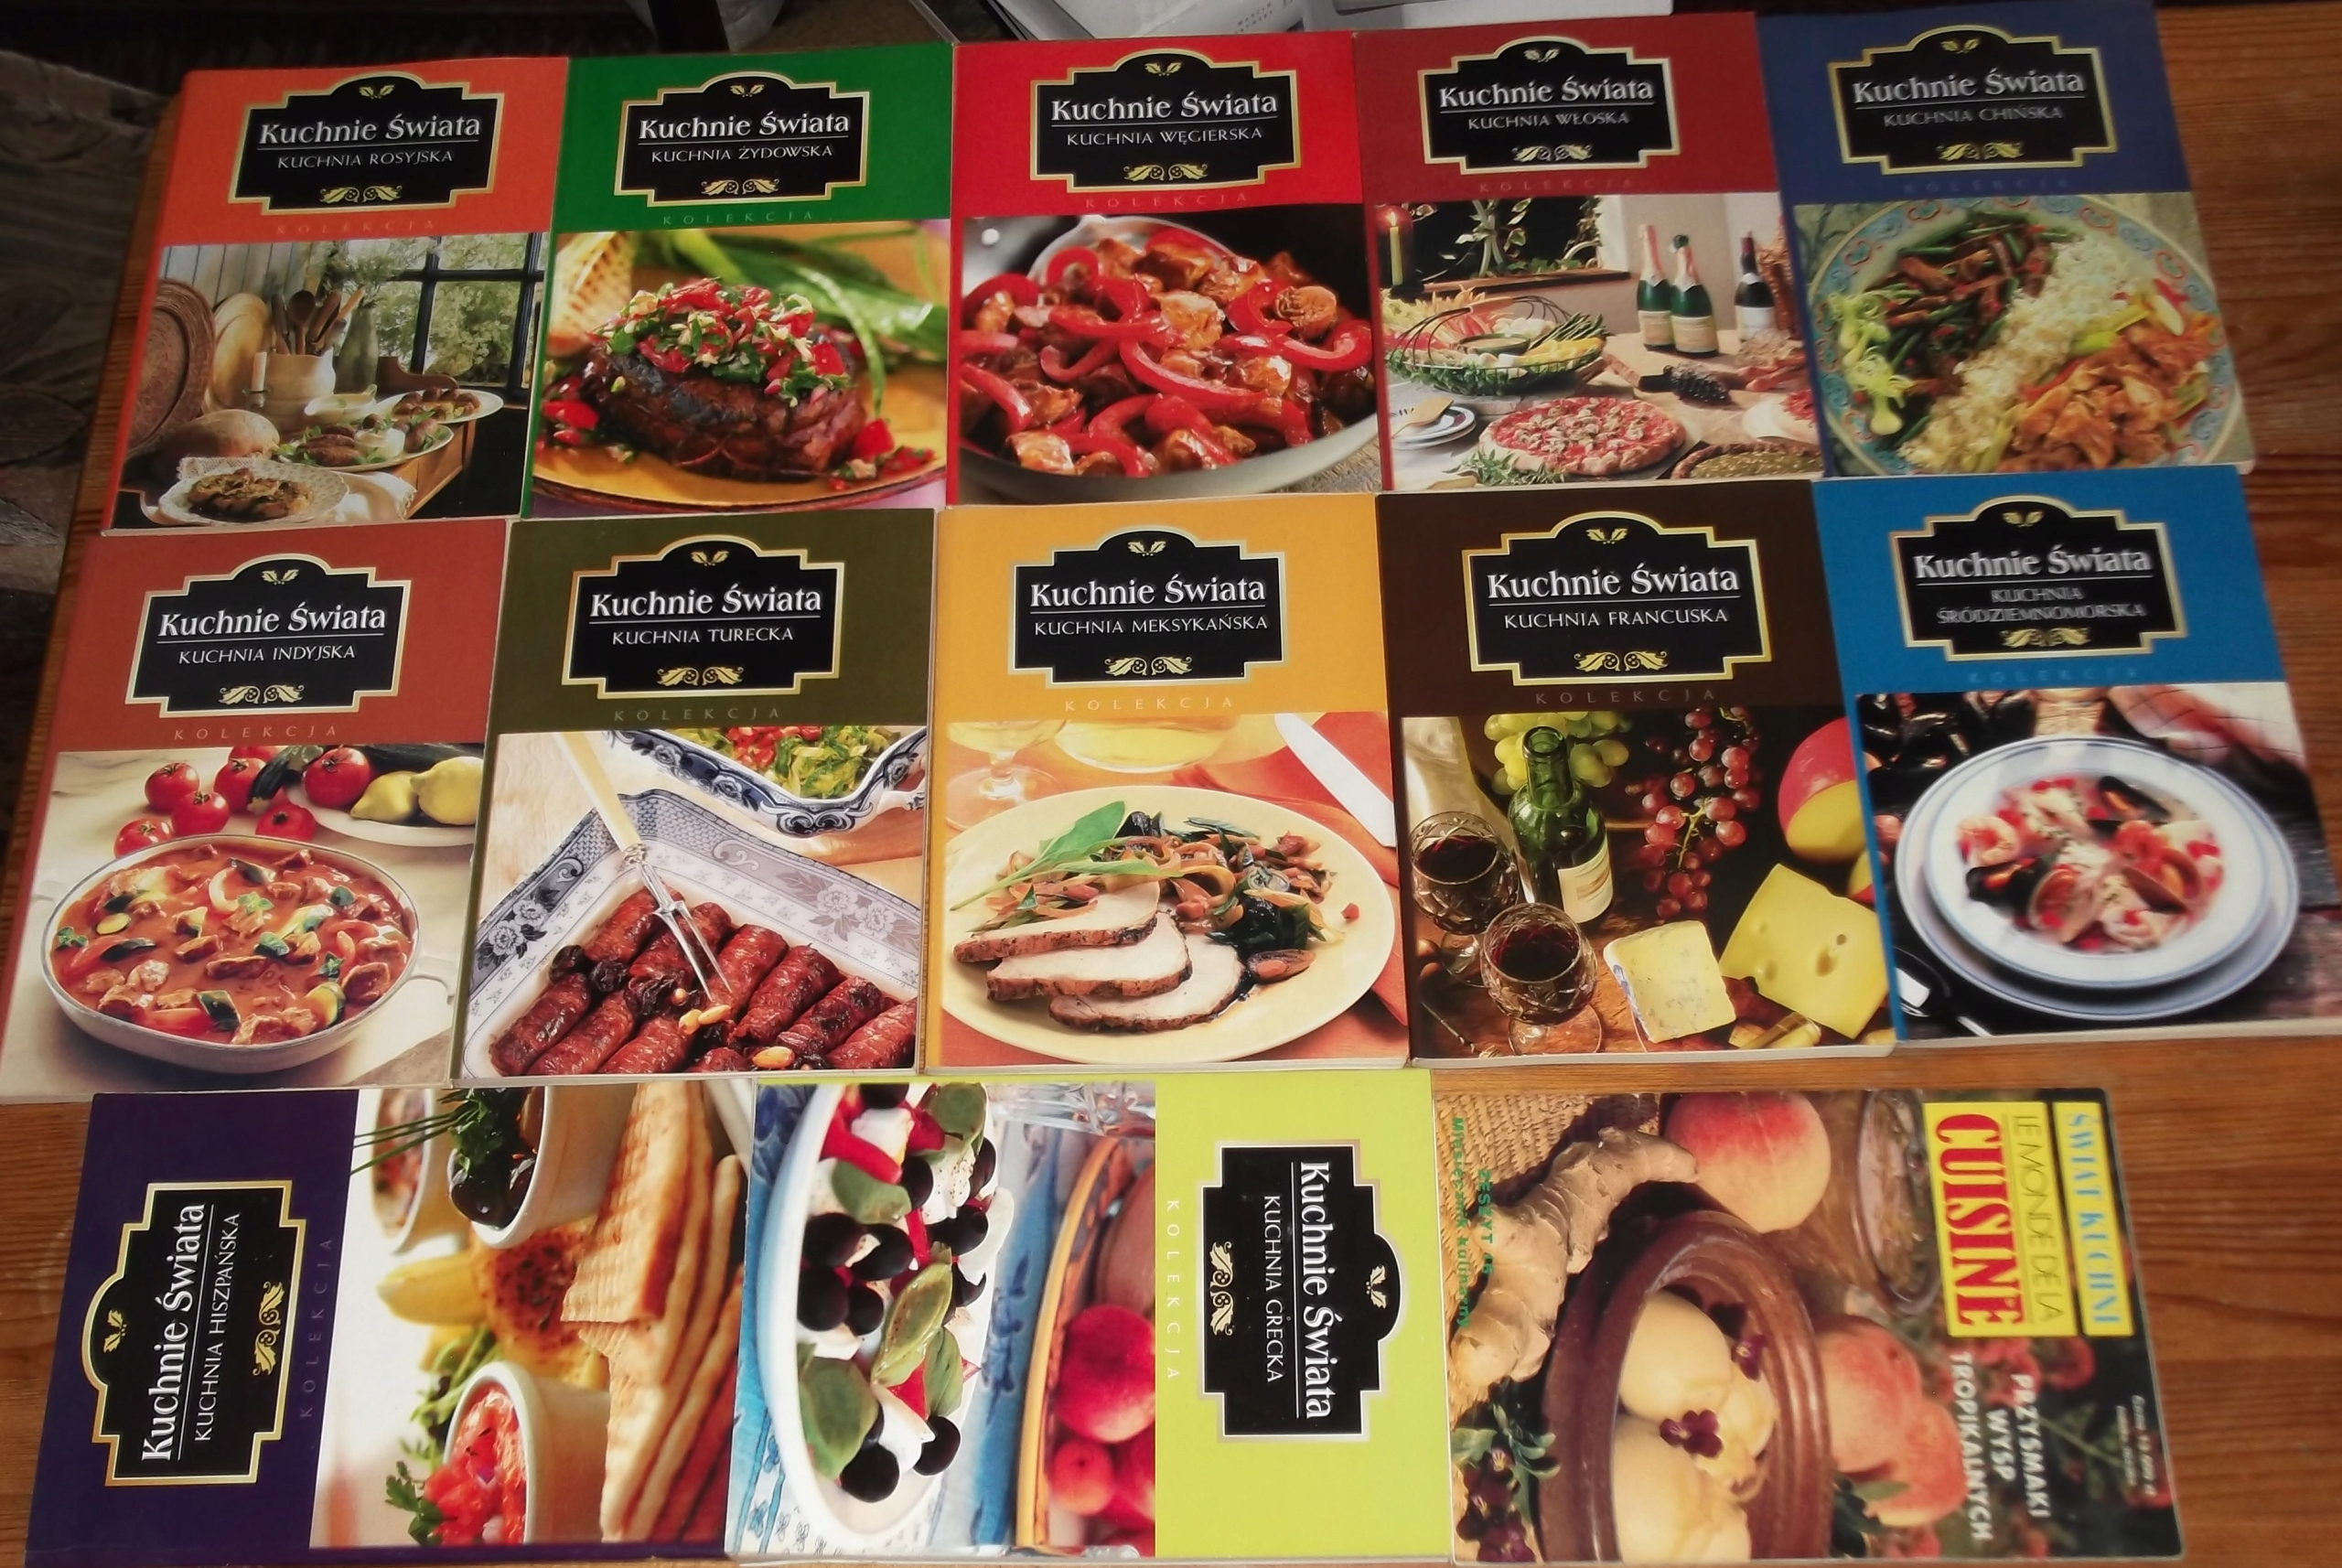 Kuchnie Swiata Kolekcja 12 Czesci Komplet Gratis